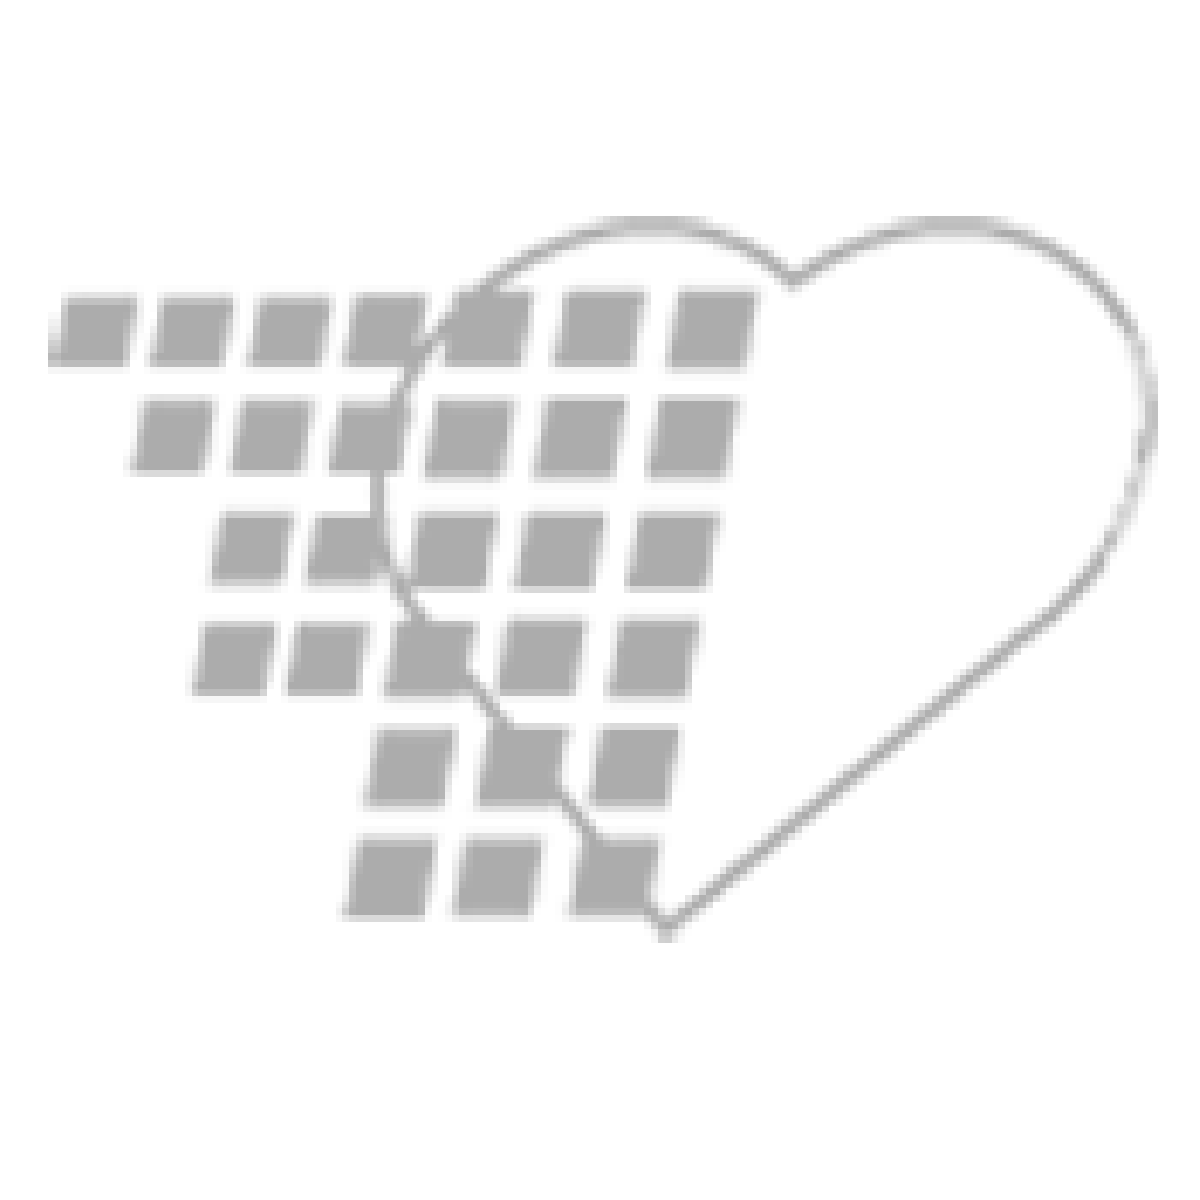 06-51-836 - Pocket Nurse® Central Line Dressing Tray with ChloraPrep® - (ships ORMD)